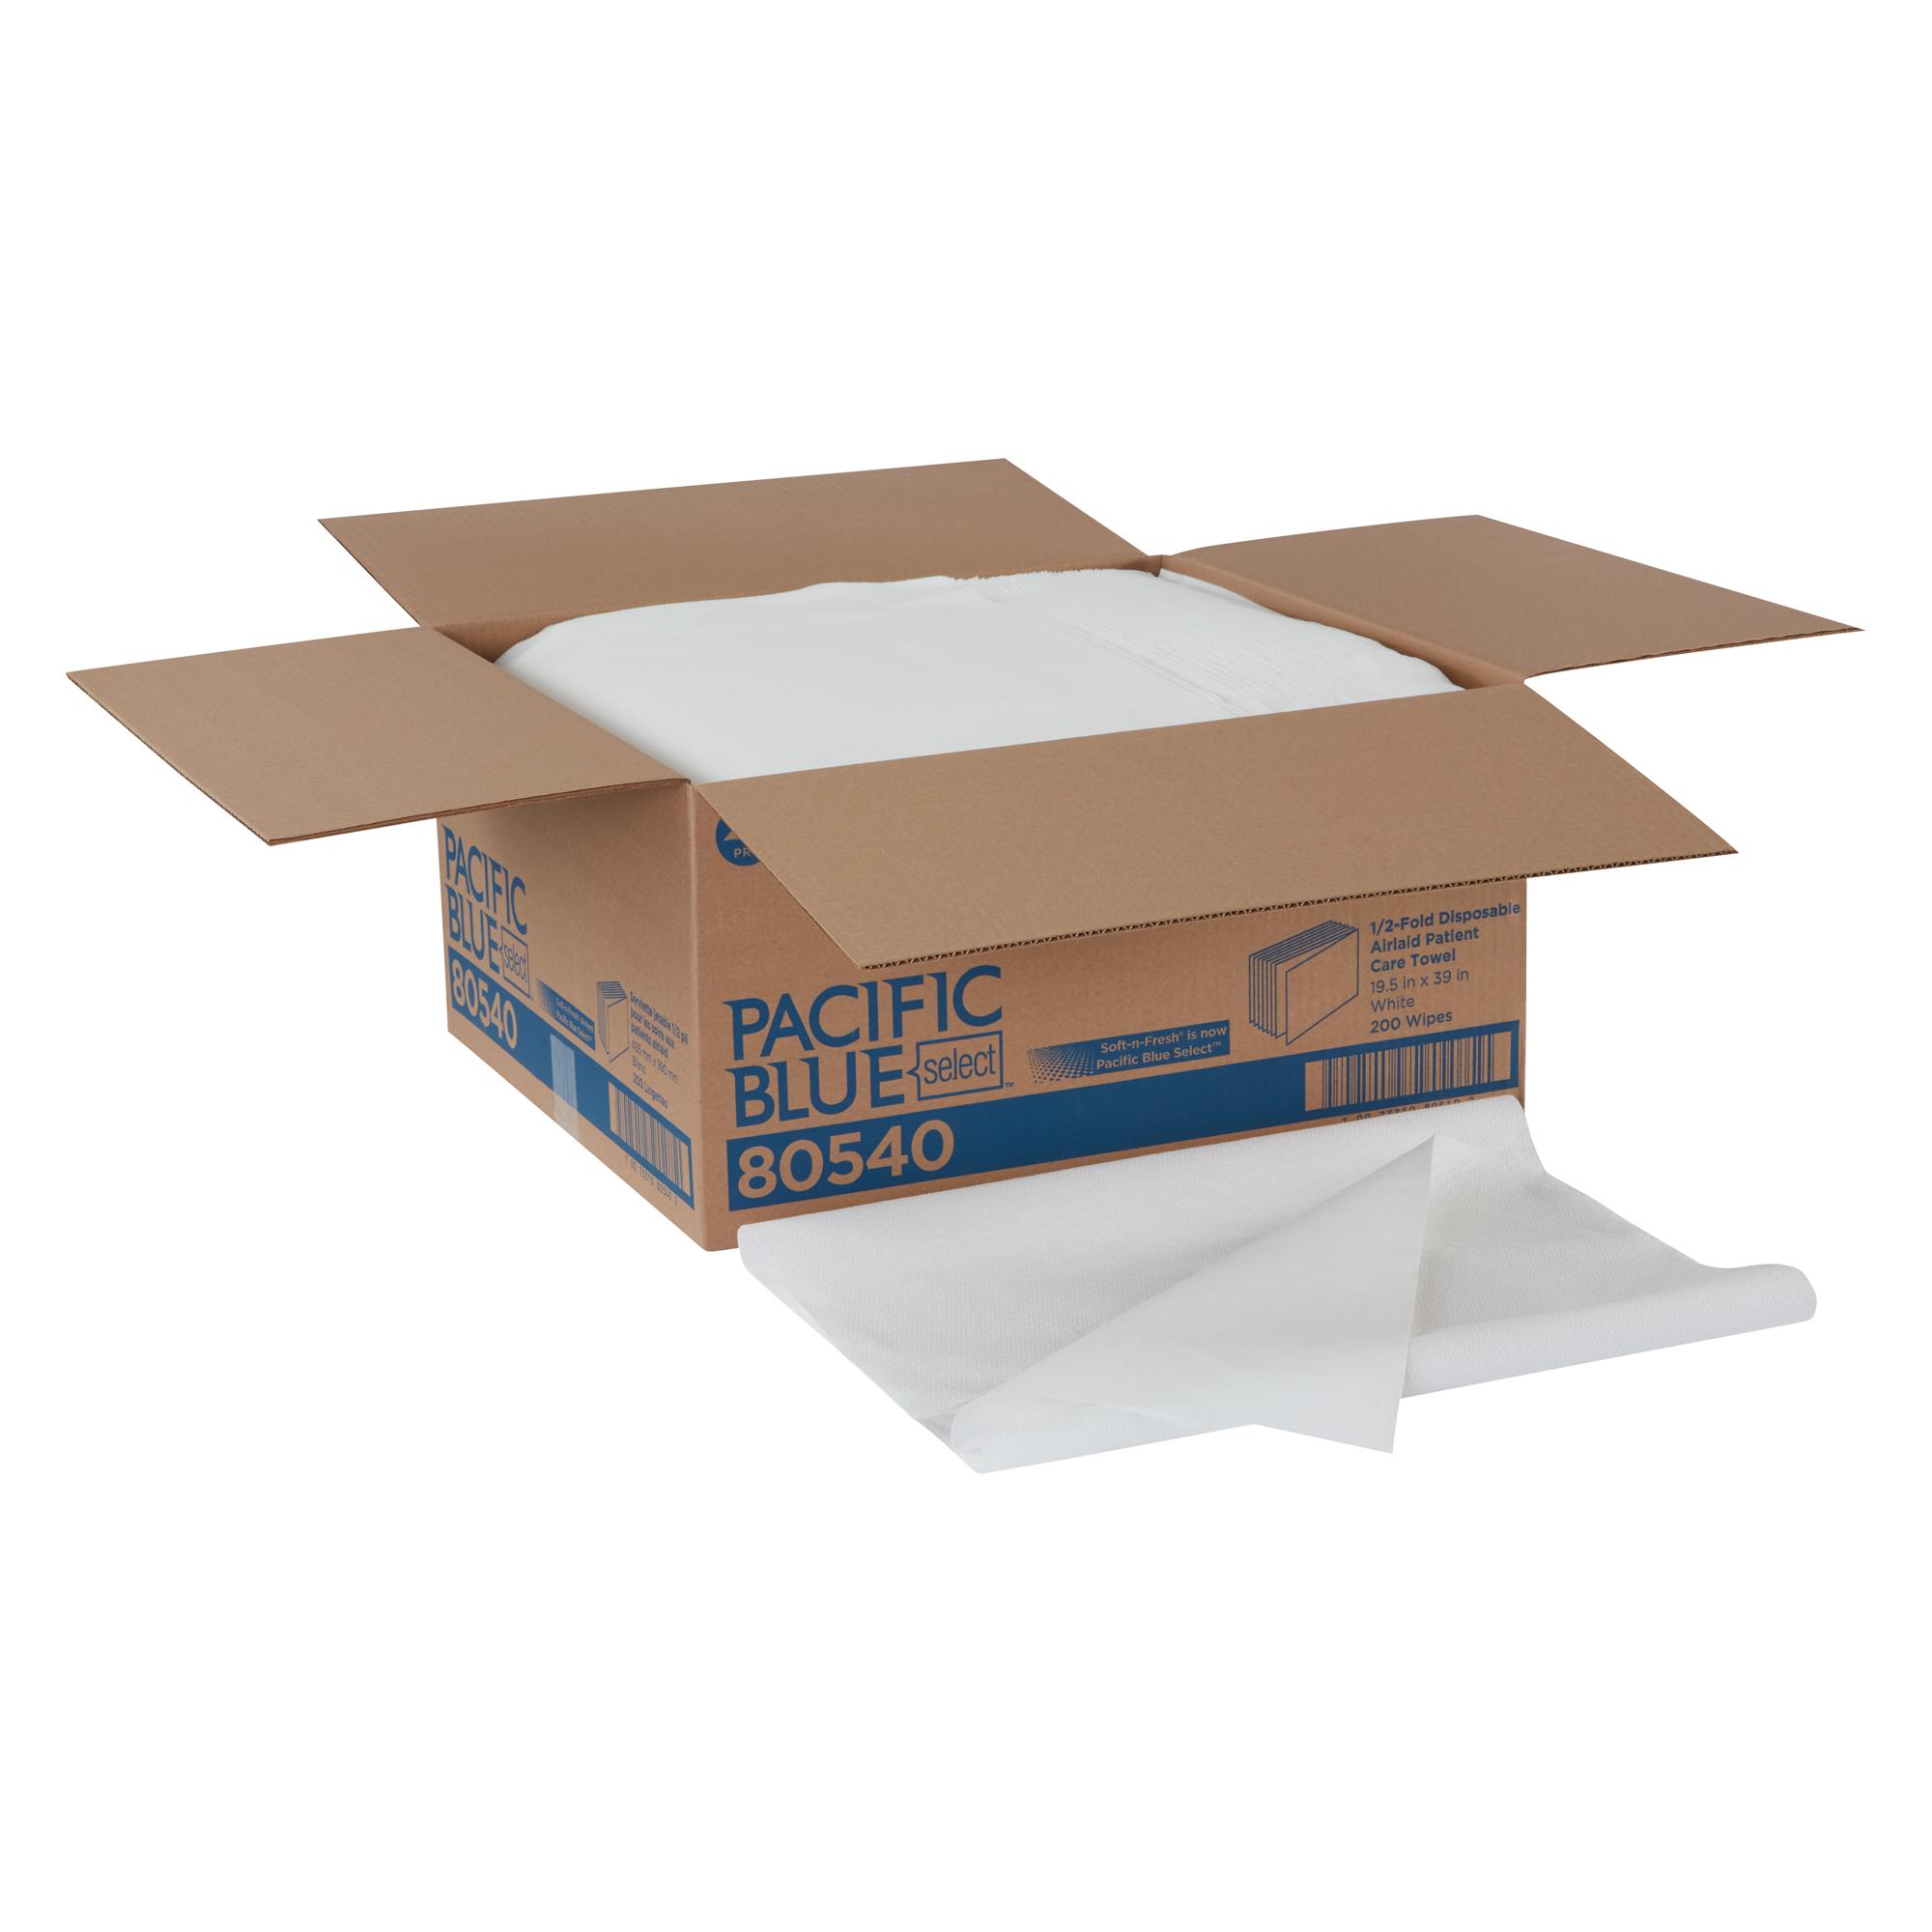 Soft-n-Fresh Patient Care Airlaid Disposable Bath Towel, White